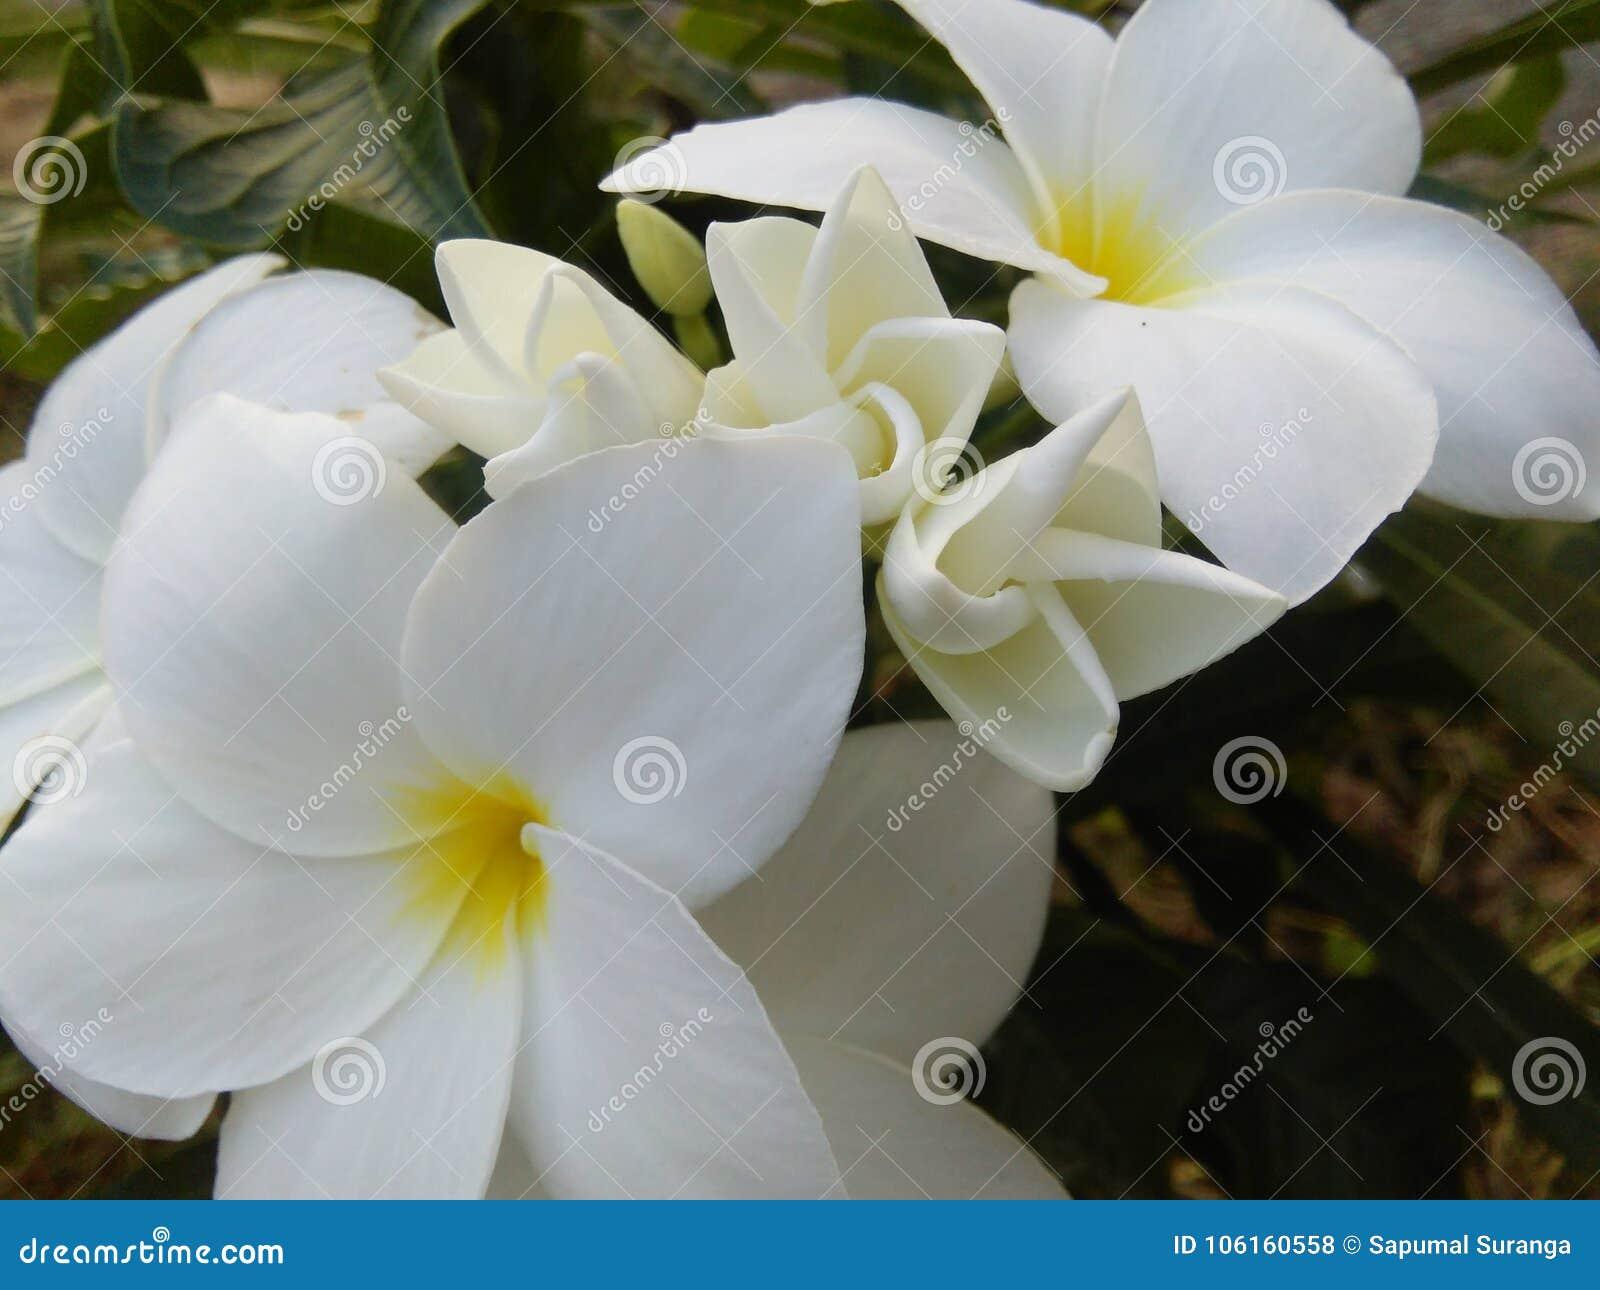 Beautiful White Color Flowers Of Sri Lankankan Photos Stock Photo